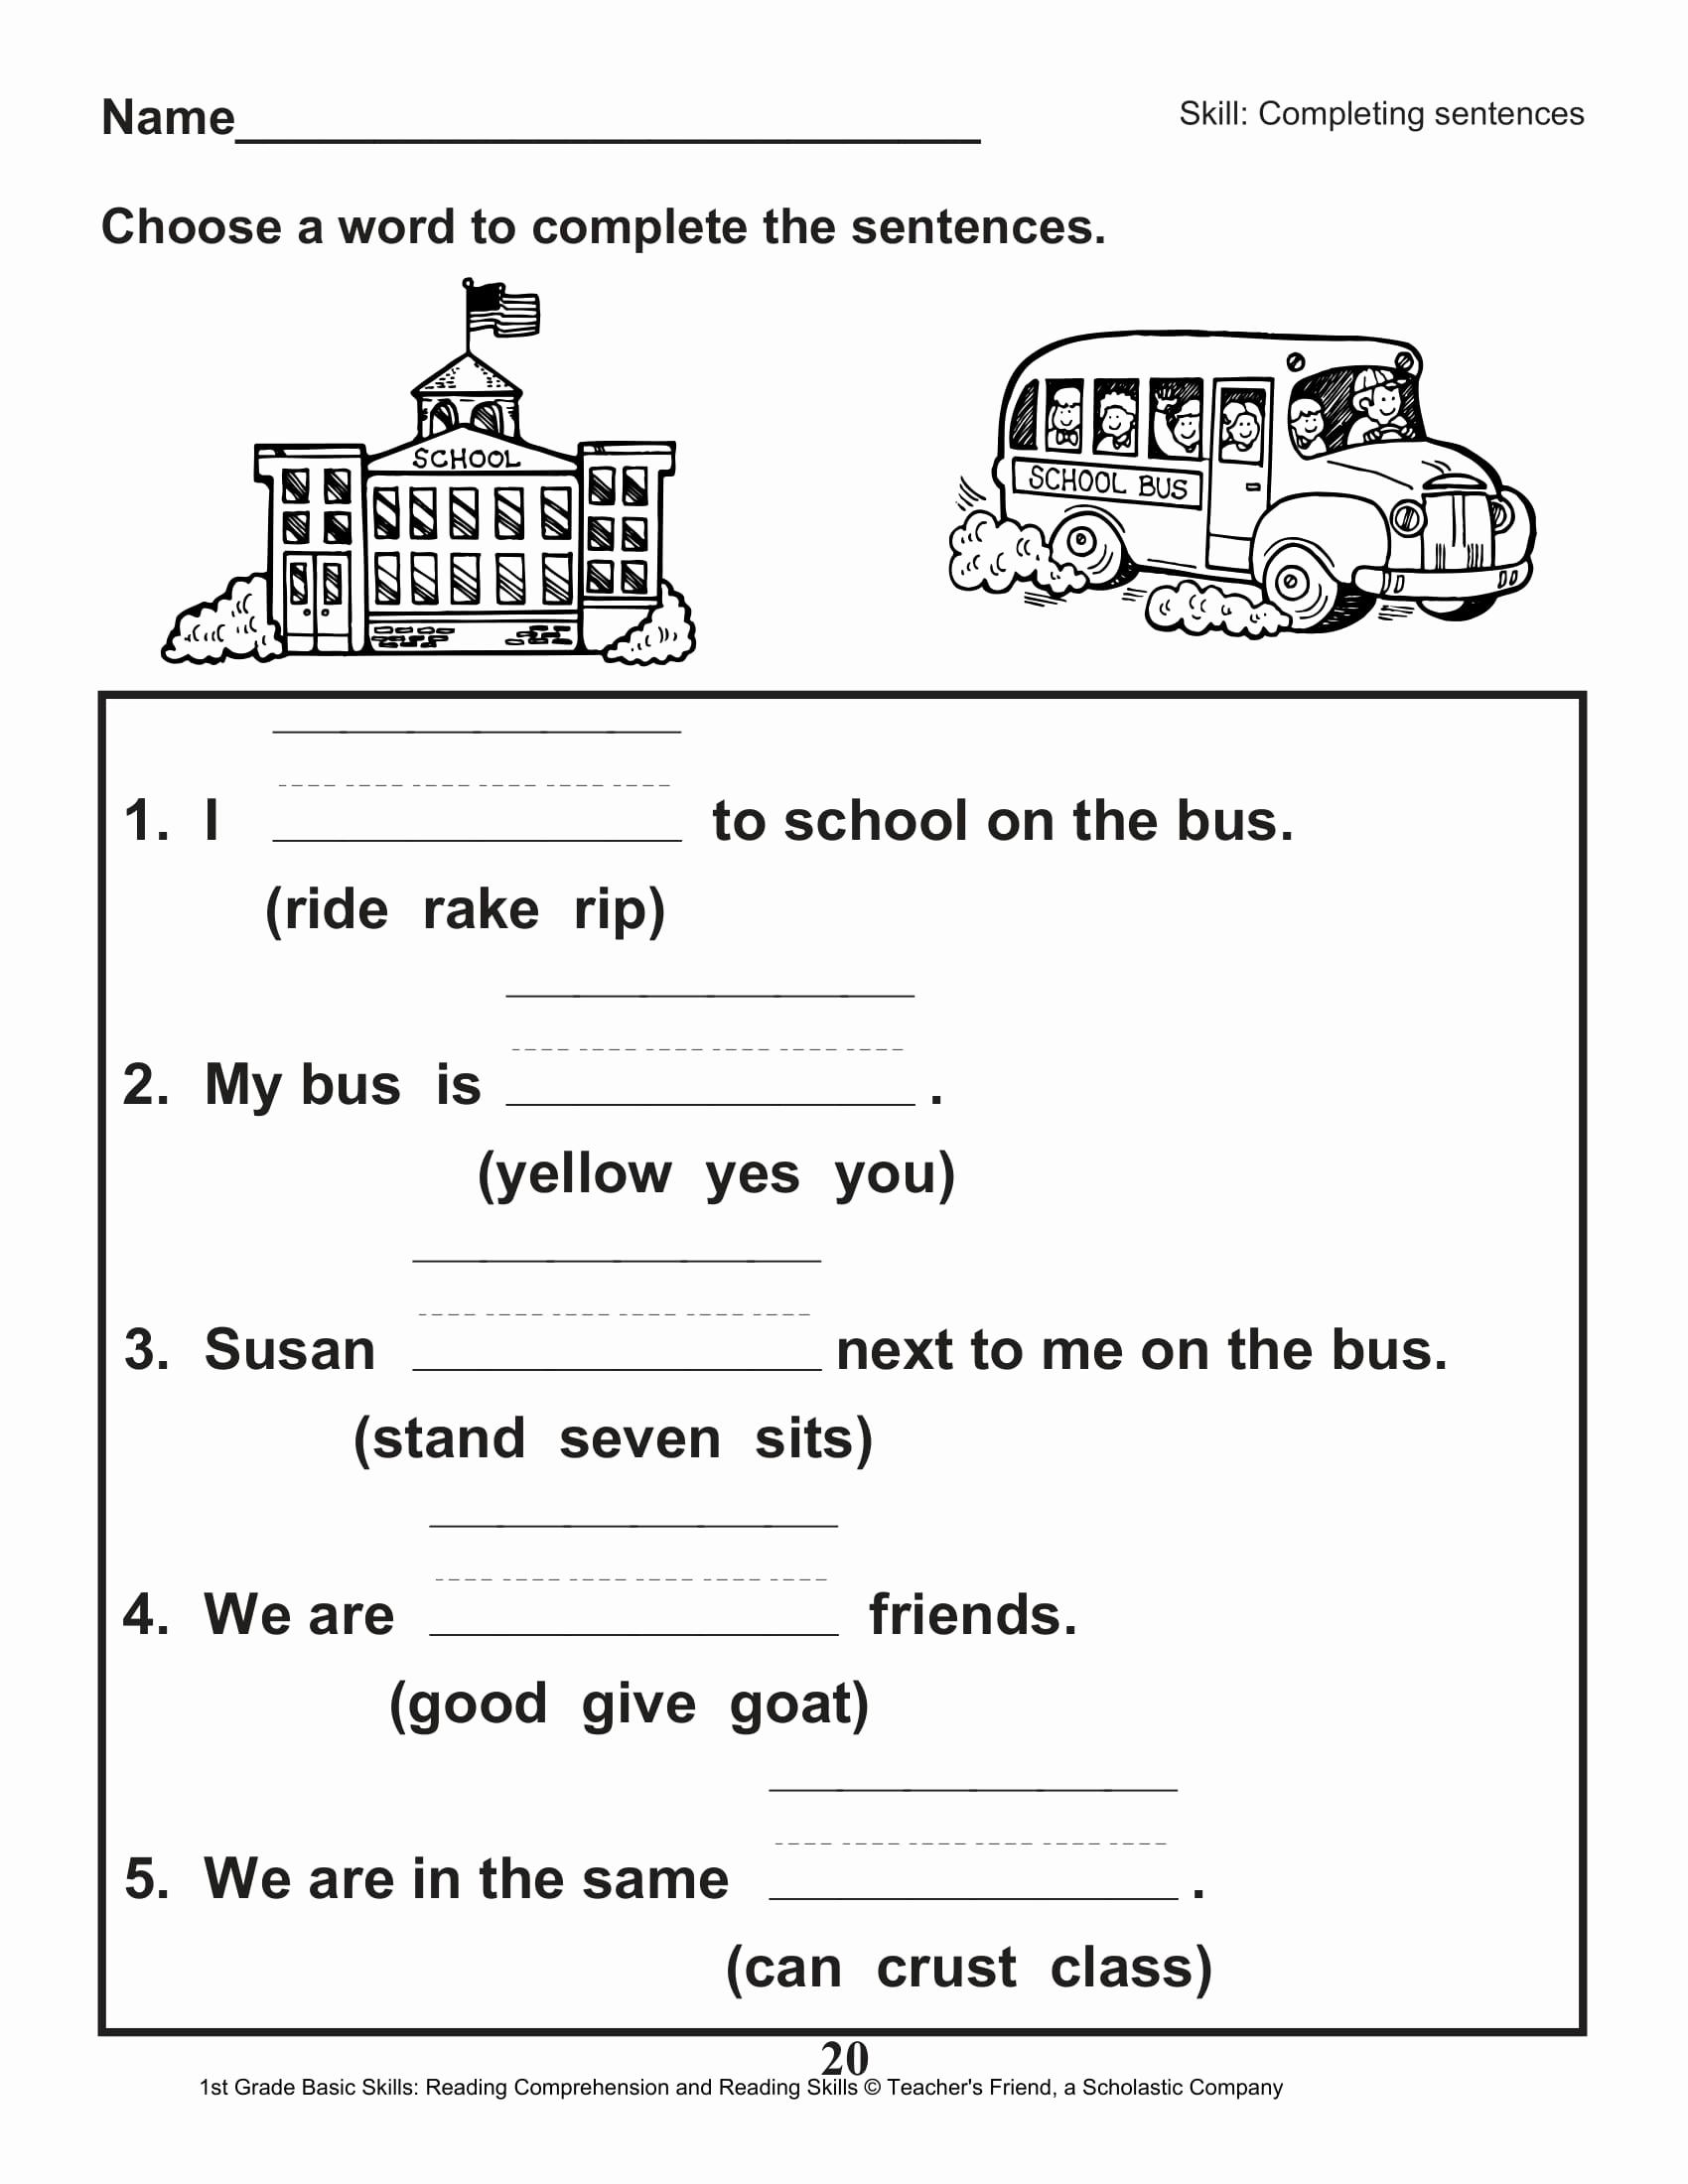 Comprehension Worksheet First Grade Lovely 40 Scholastic 1st Grade Reading Prehension Skills